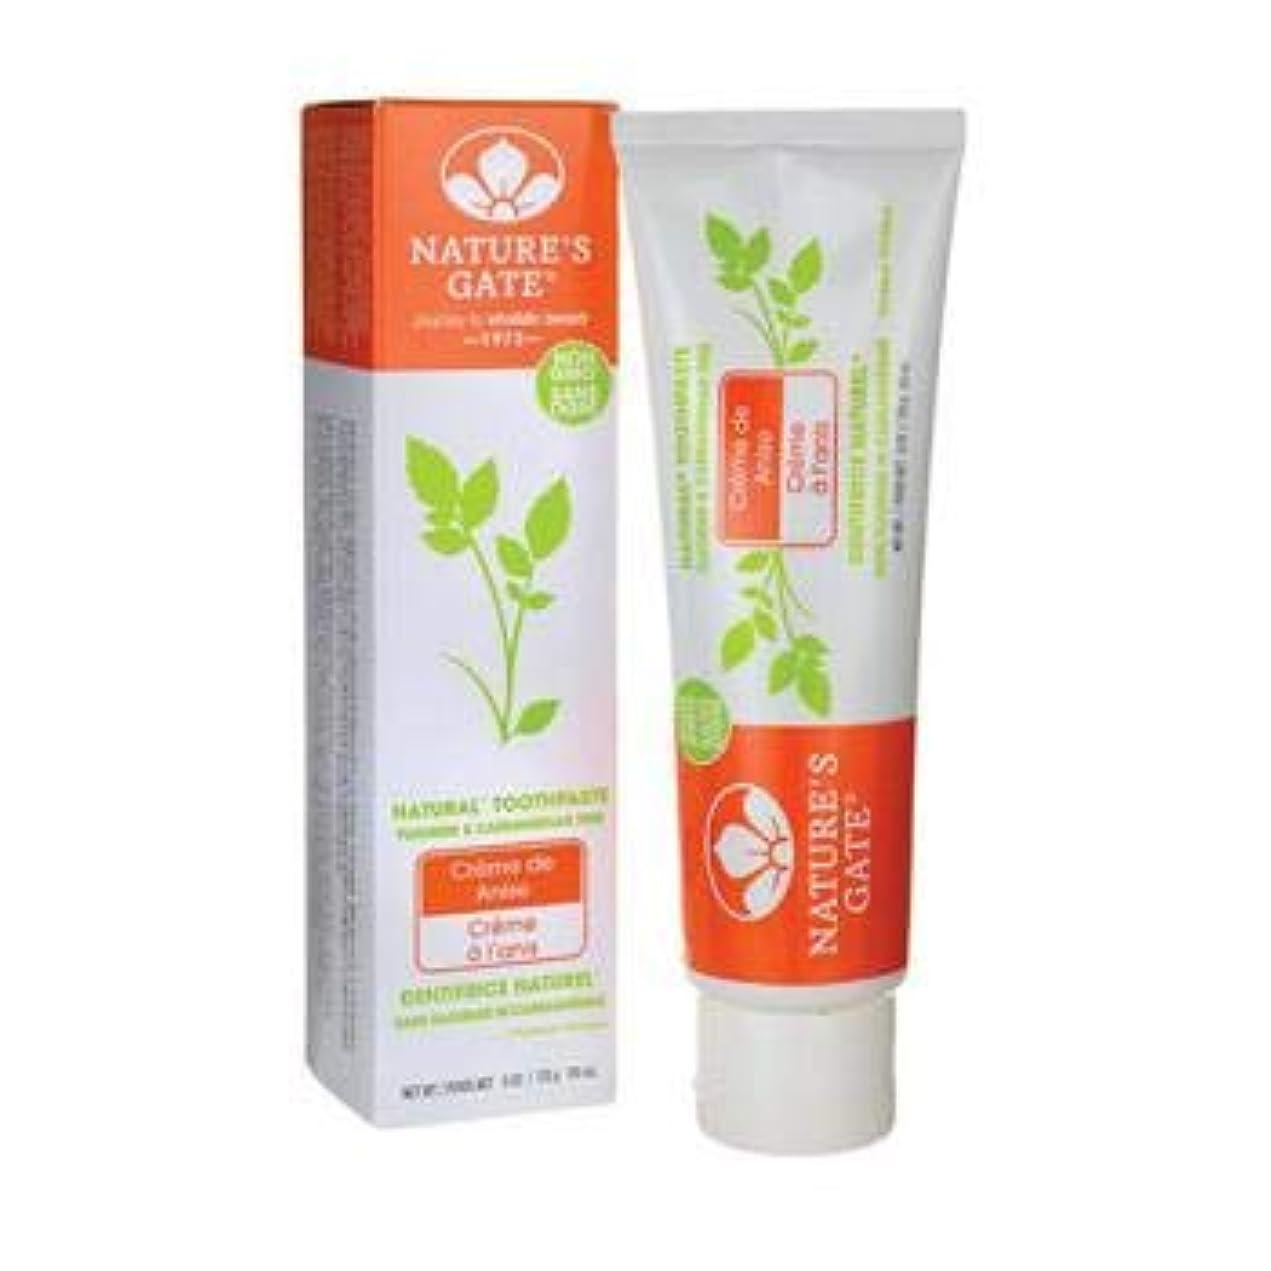 海外直送品Toothpaste Creme De, Anise 6 Oz by Nature's Gate